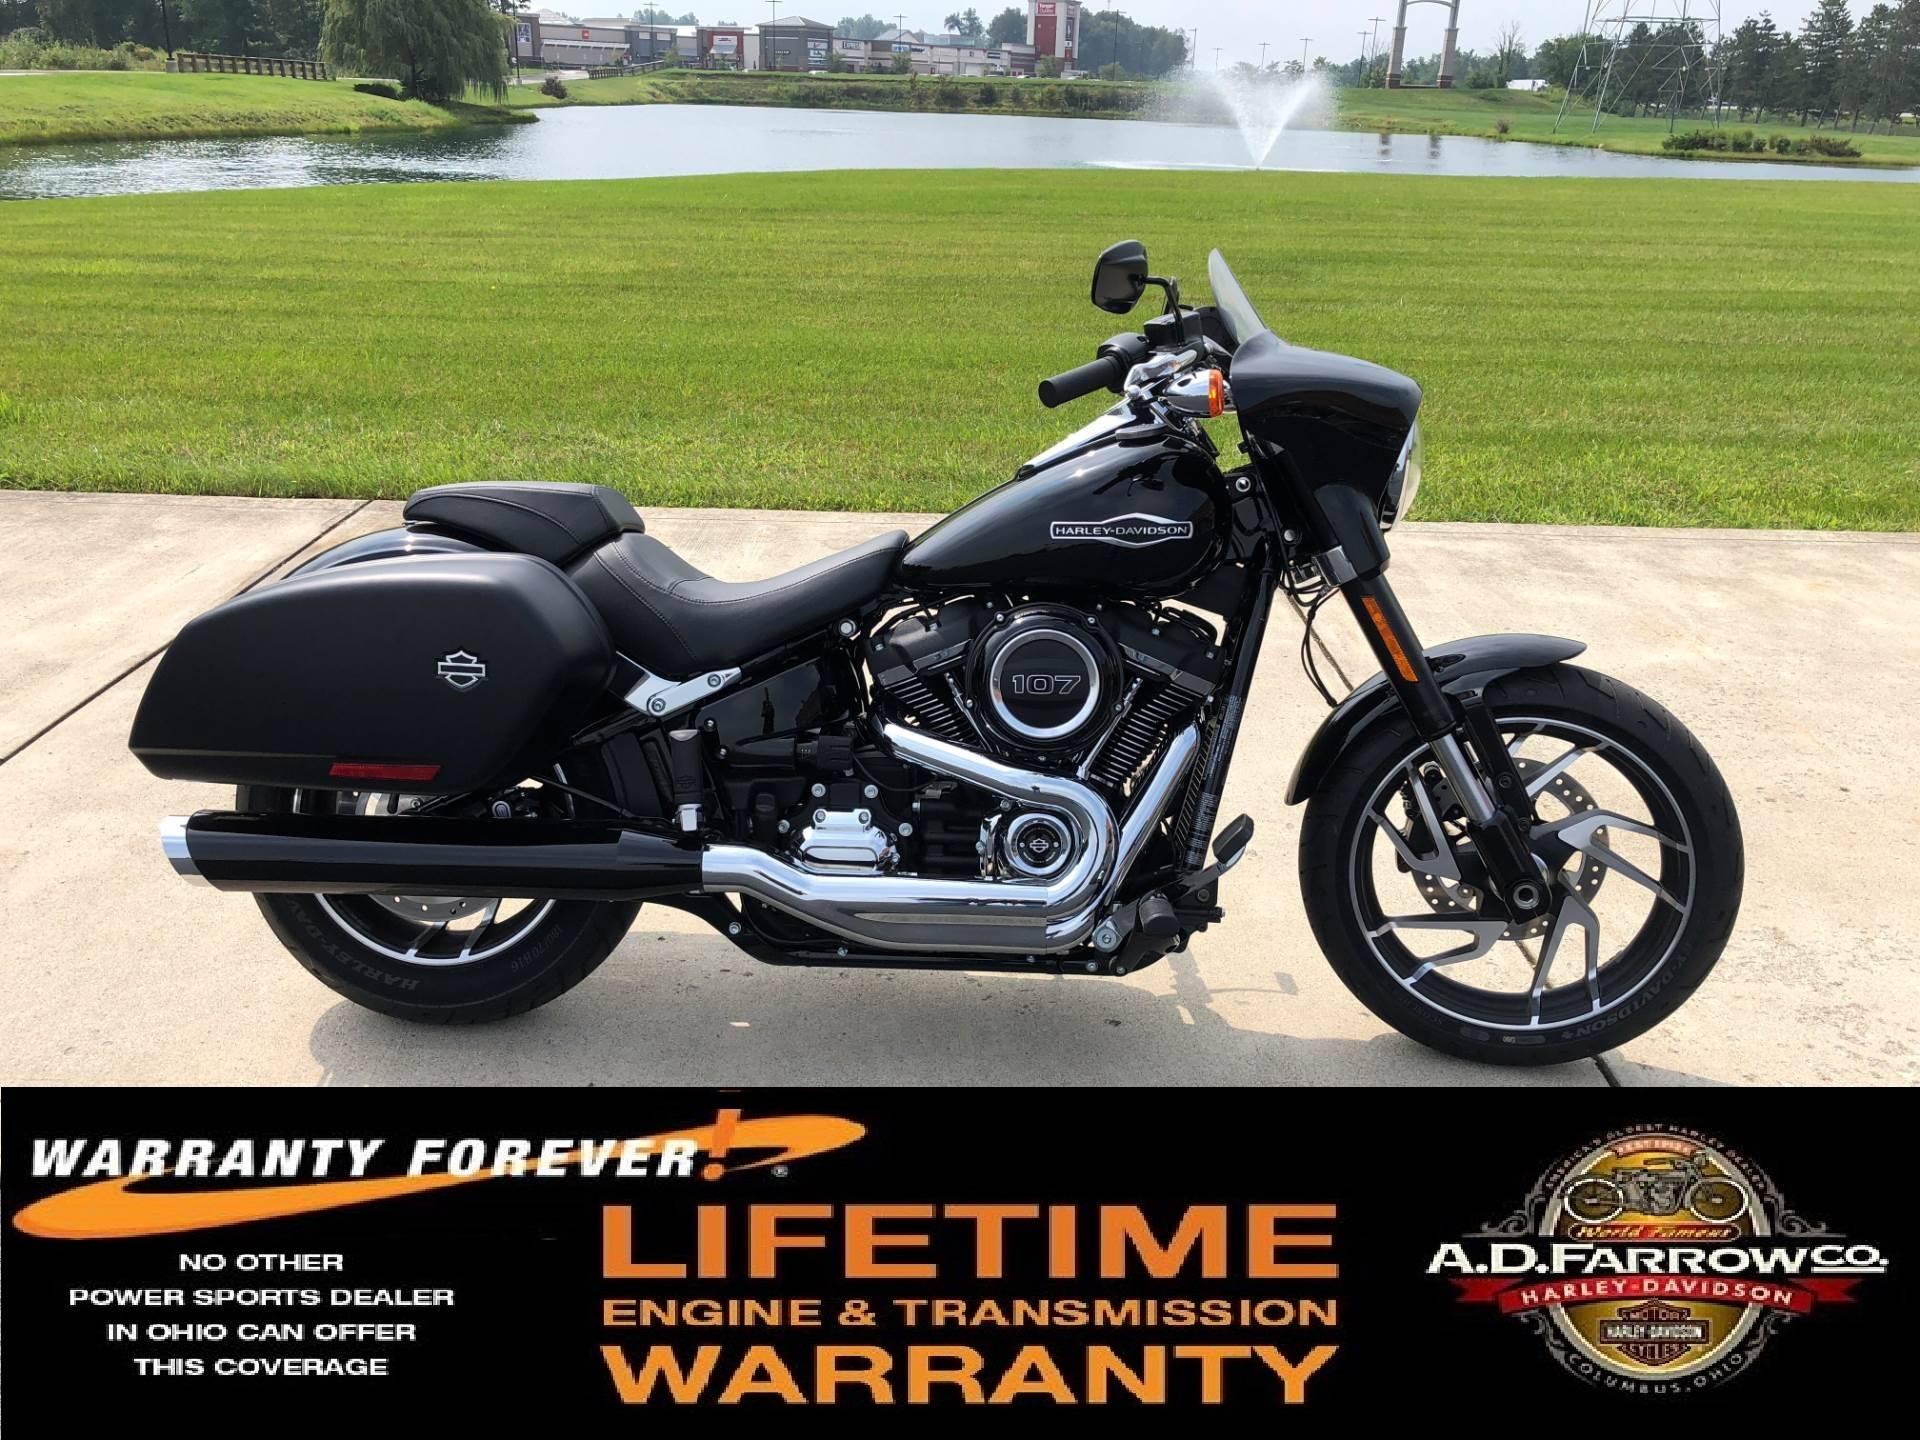 2018 harley davidson sport glide motorcycles sunbury ohio. Black Bedroom Furniture Sets. Home Design Ideas